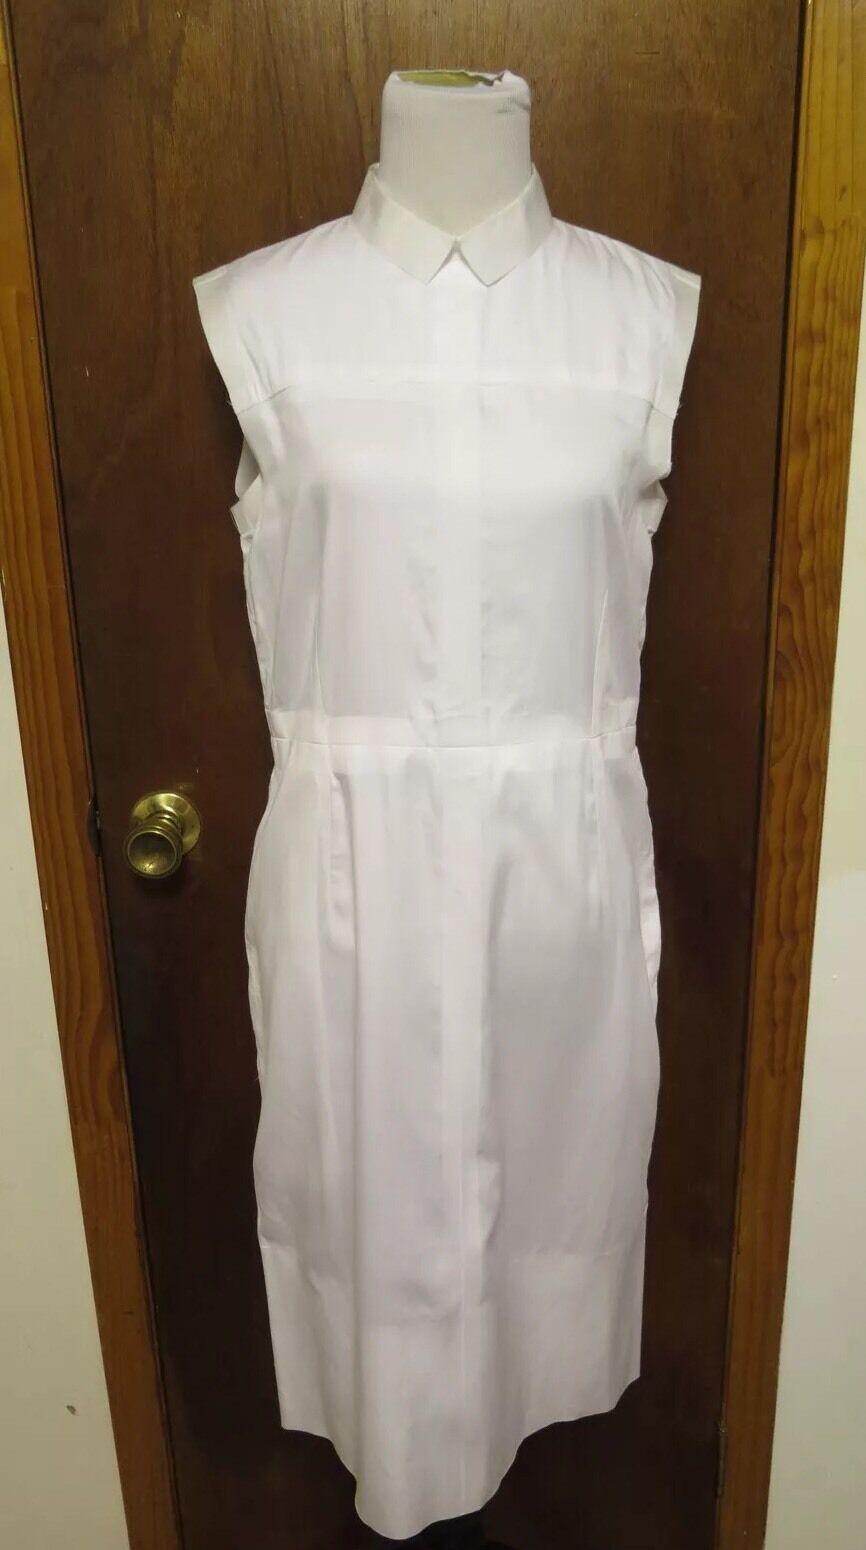 Celine Crisp White Contrast Cotton Sleeveless Shift Dress Sz 40 S Philo